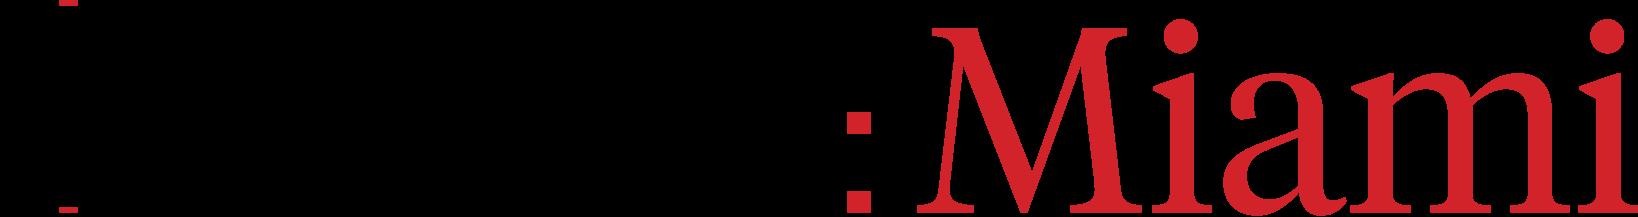 Invest Miami logo1.png